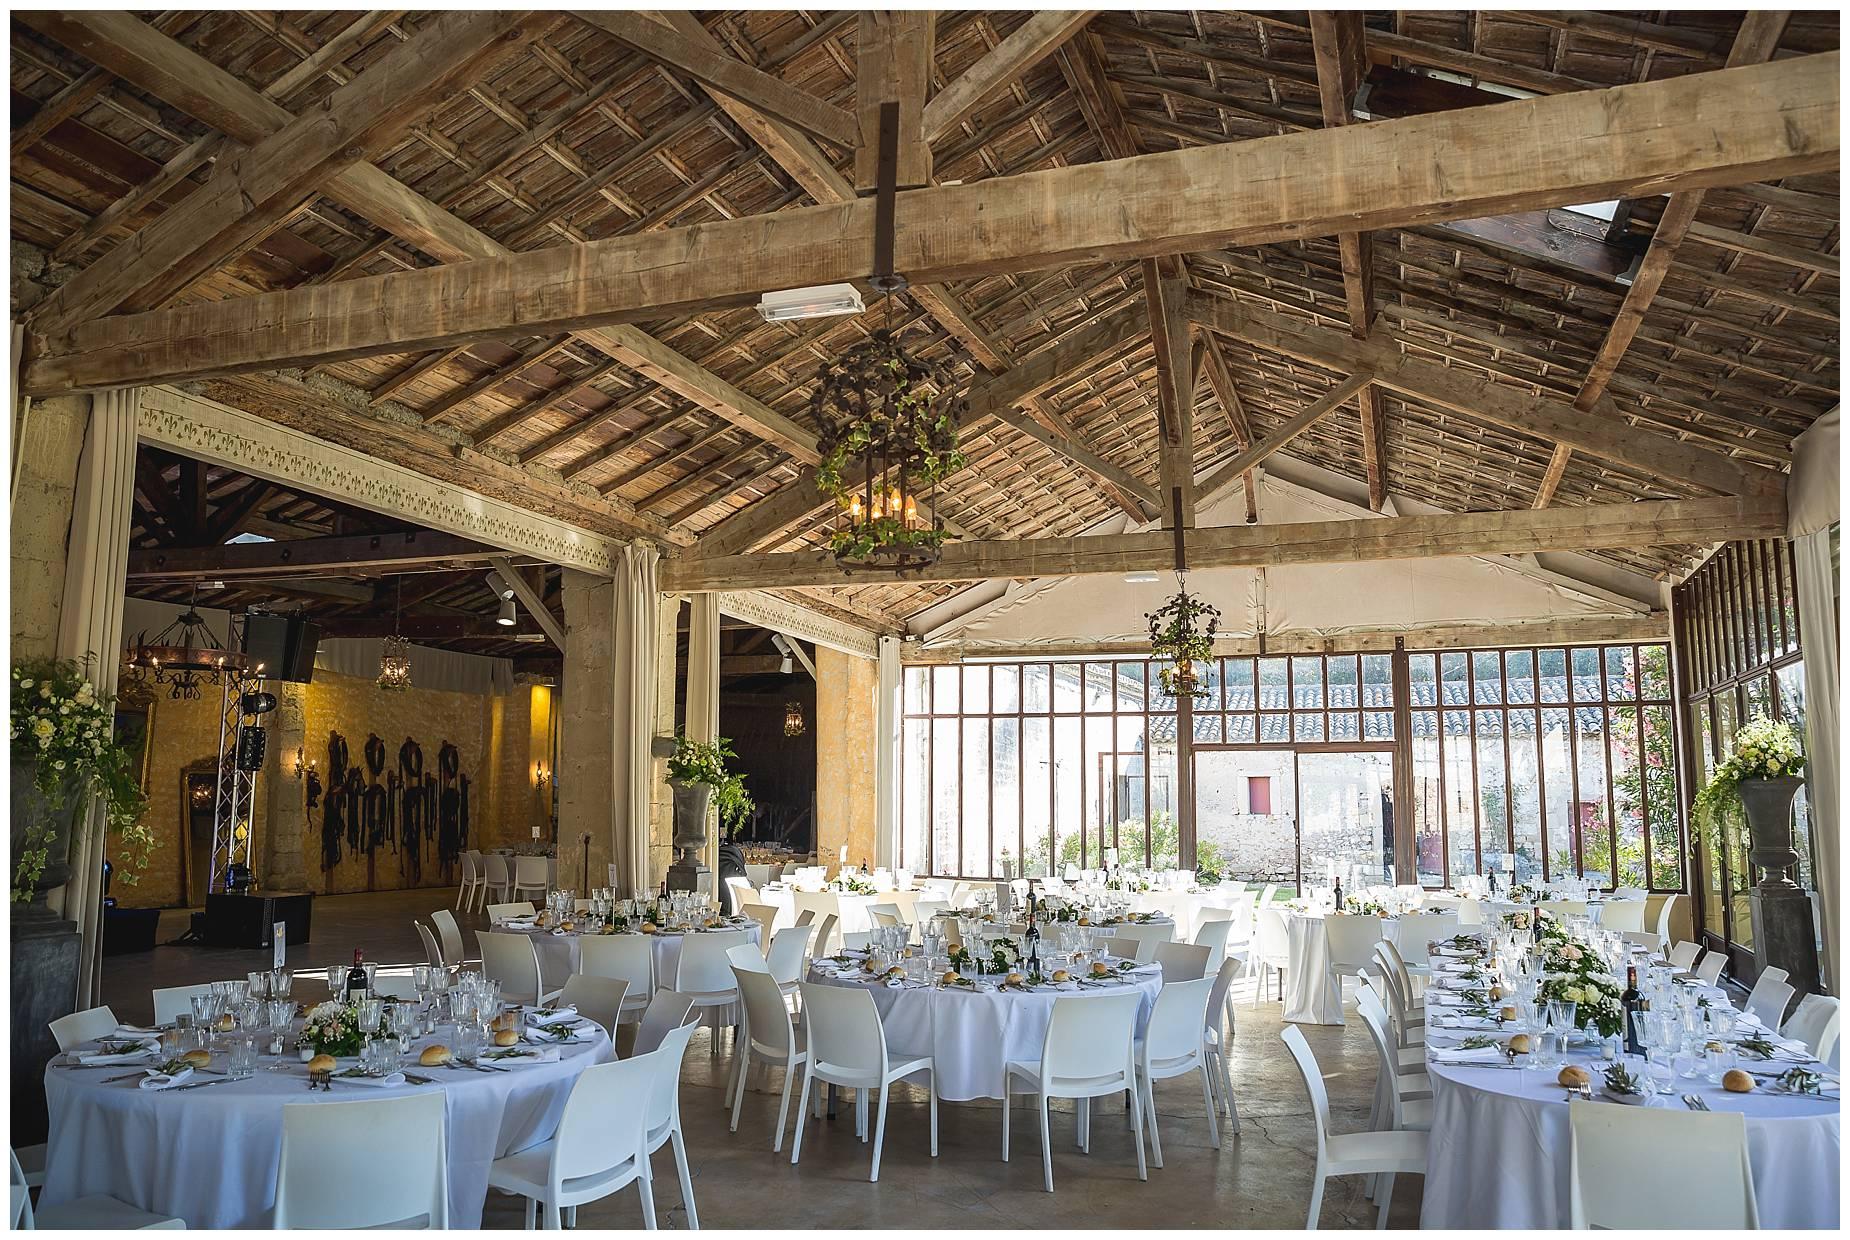 room set up at Chateau de Pouget wedding